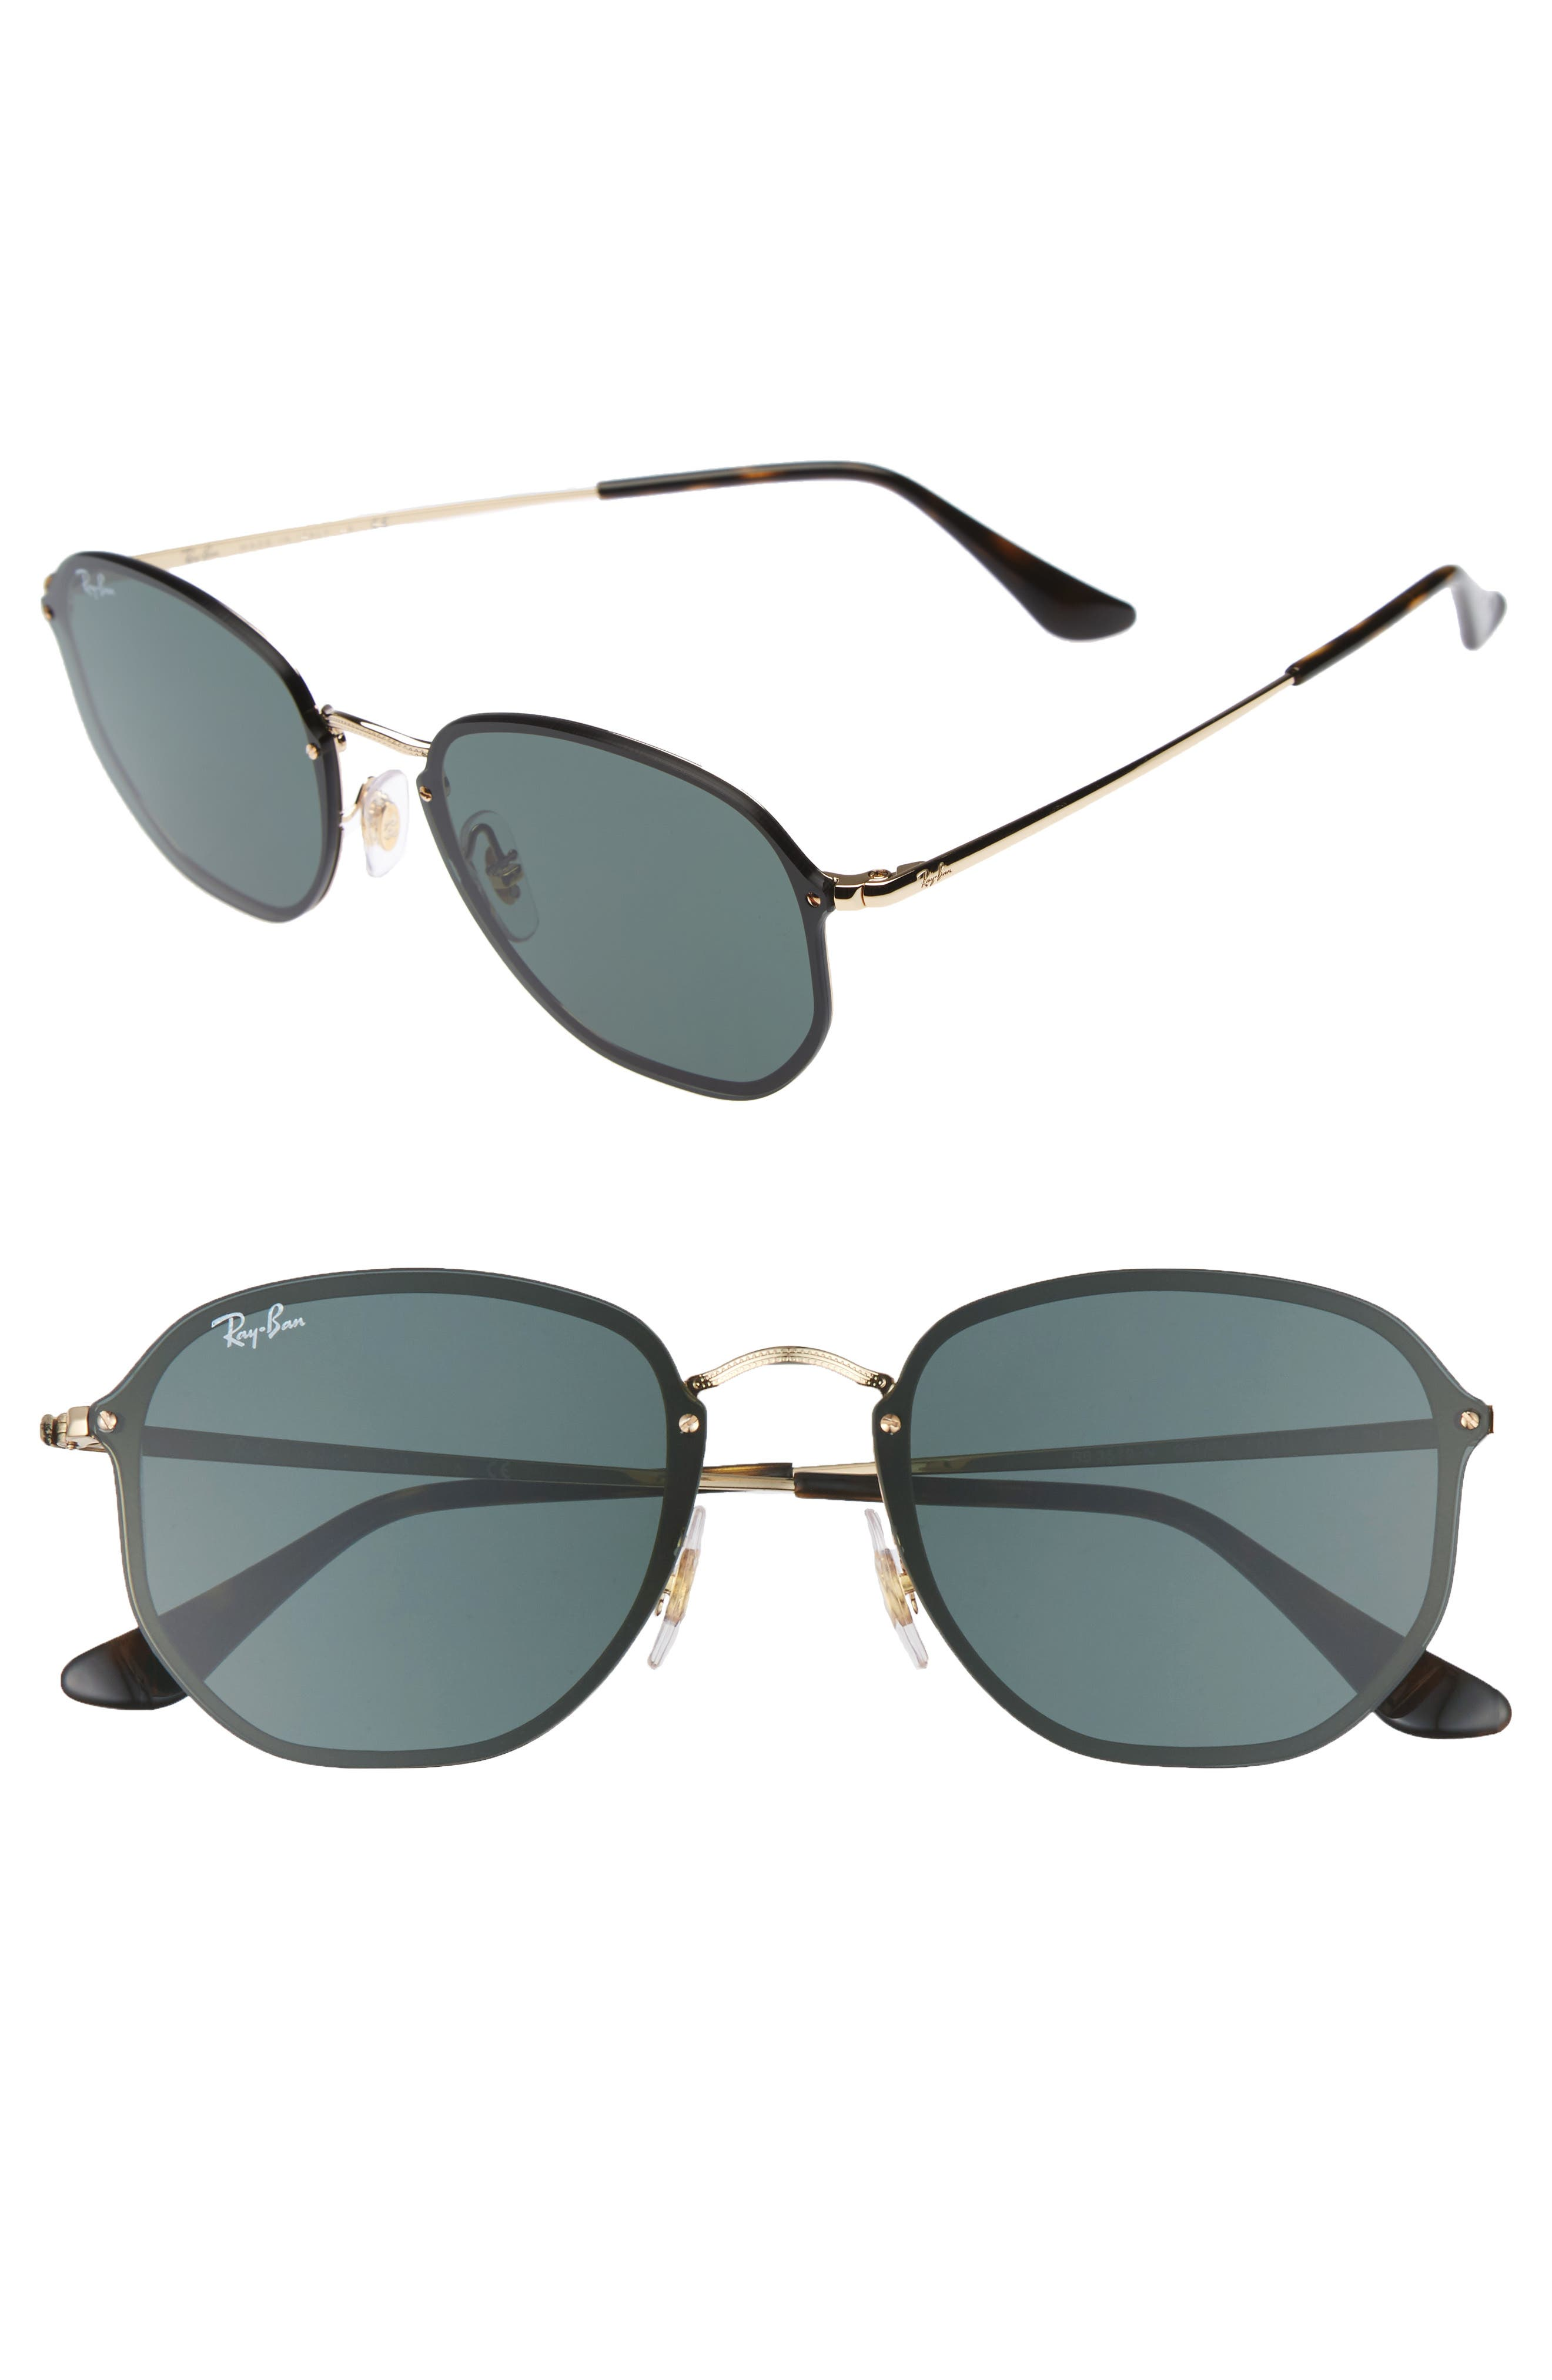 58mm Aviator Sunglasses,                         Main,                         color, Gold/ Green